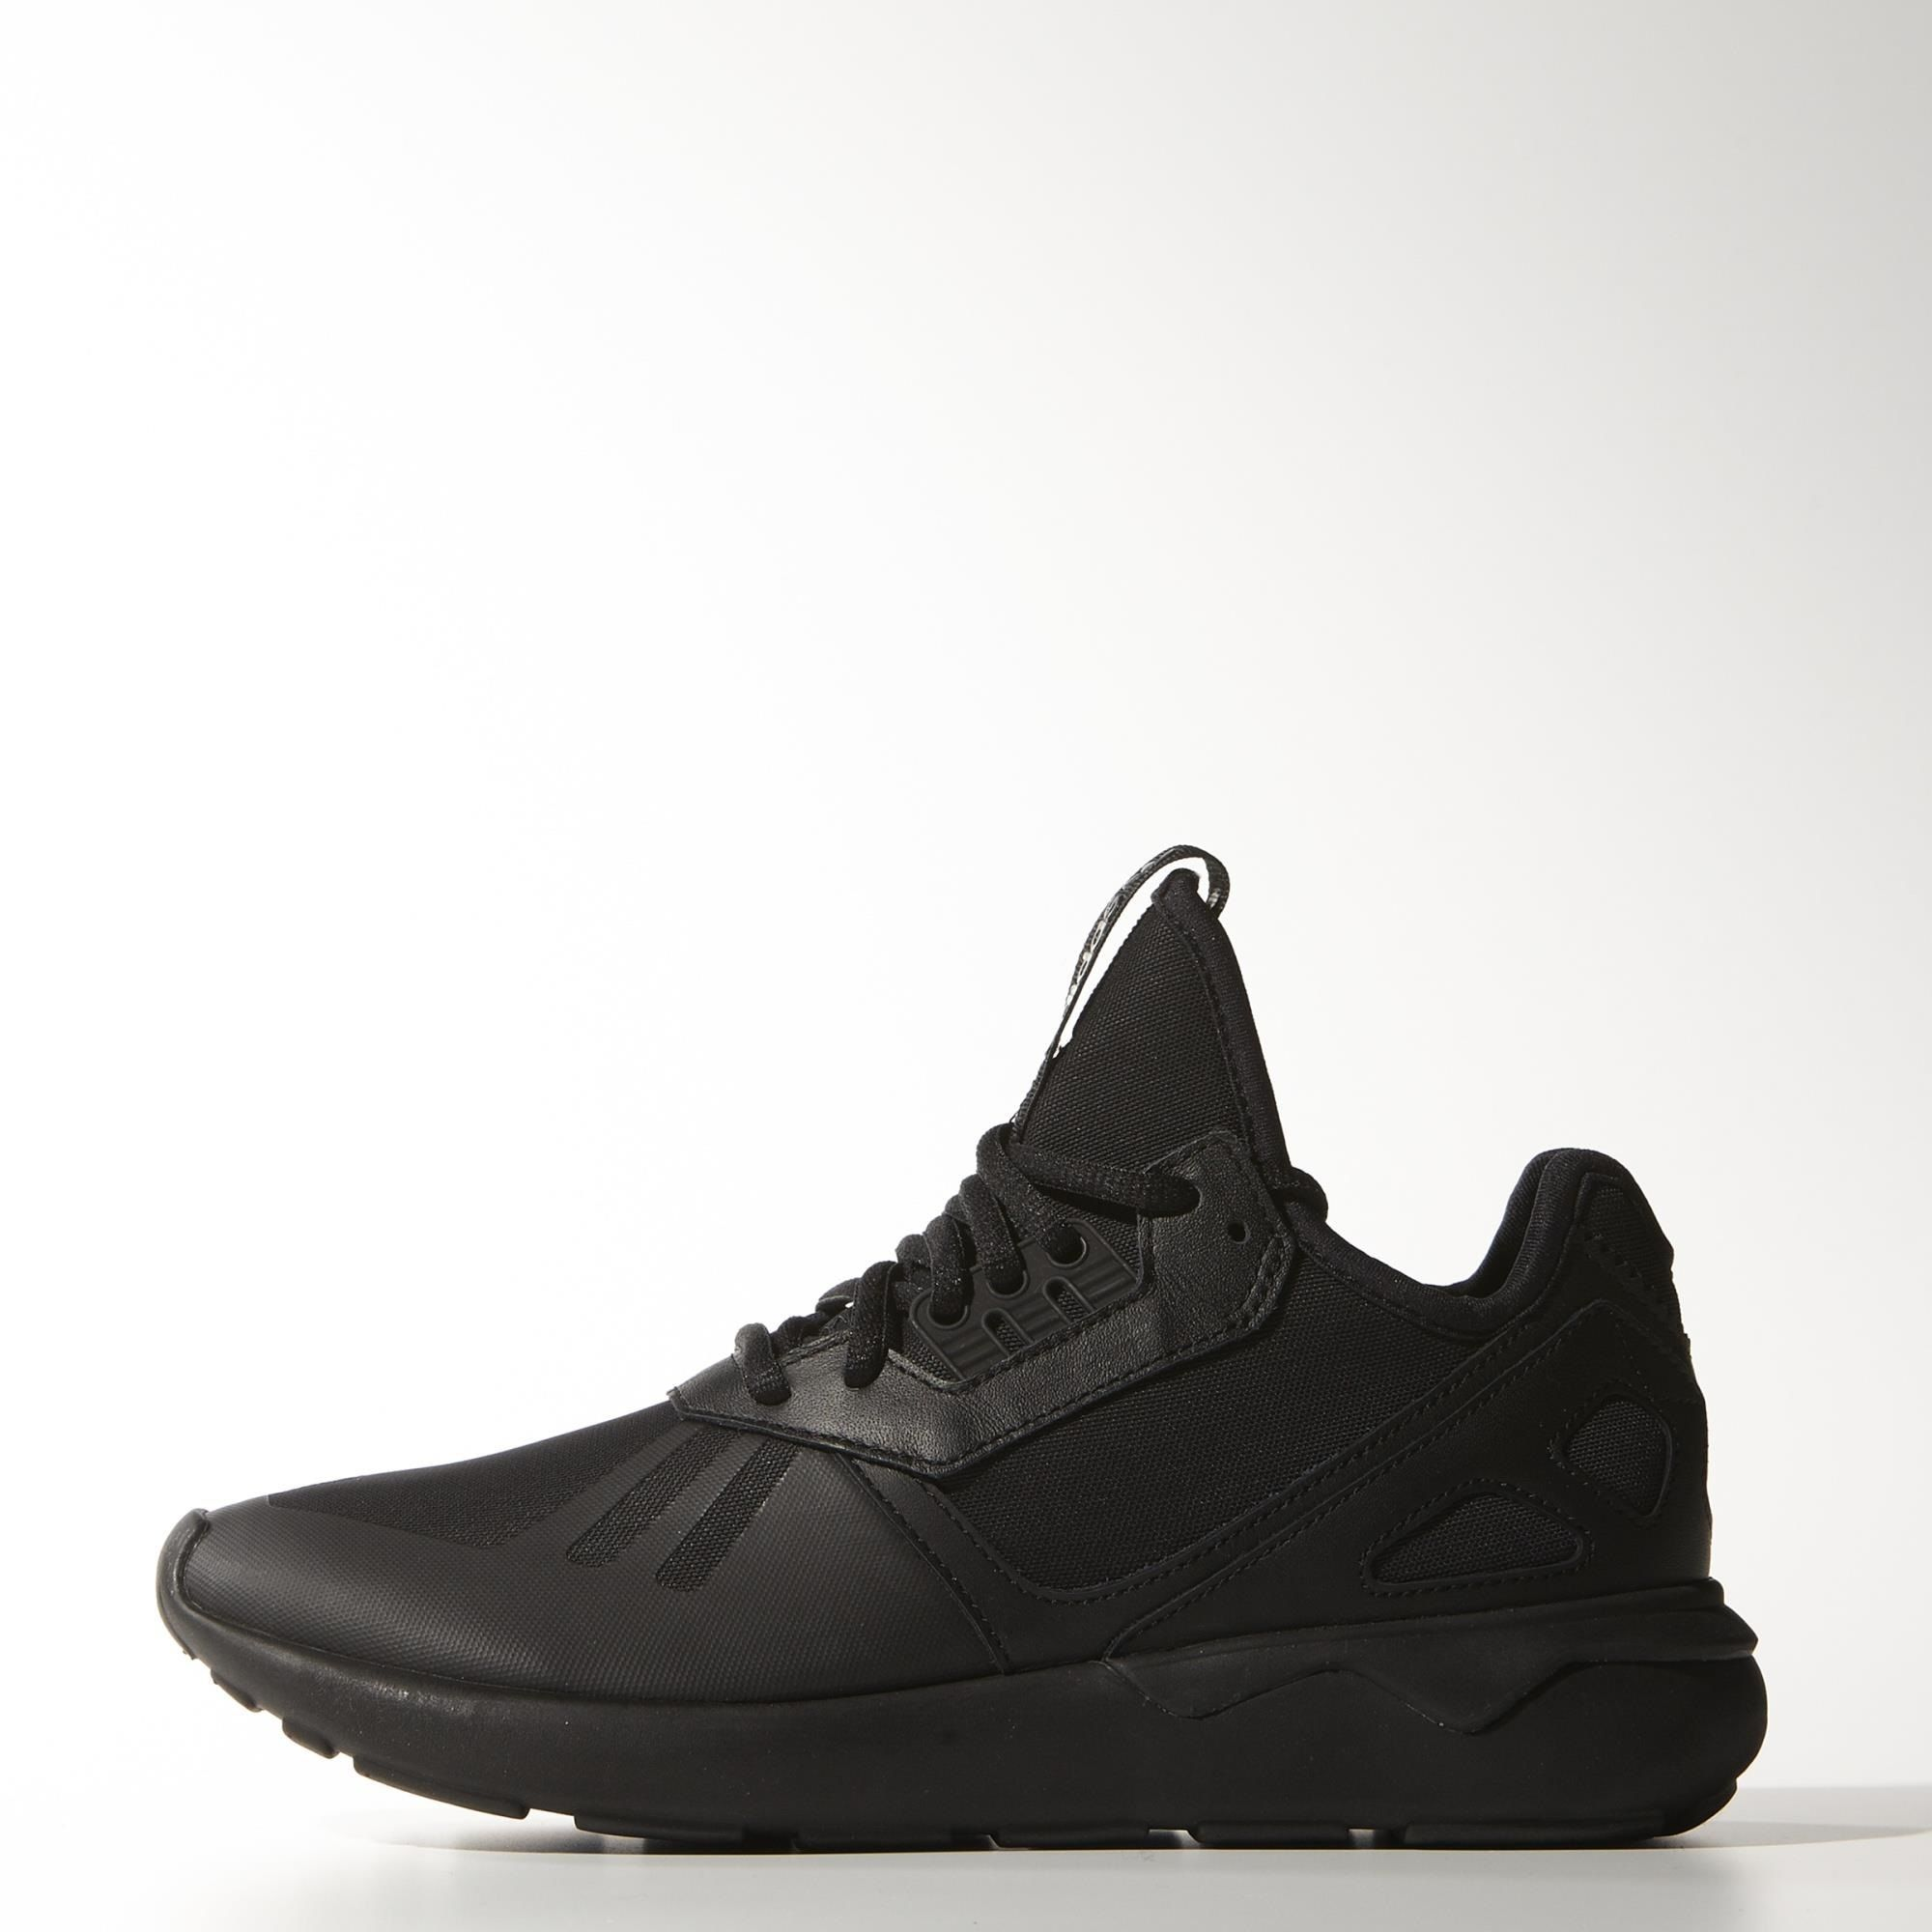 adidas Tubular Runner Shoes - Black  ab2139662